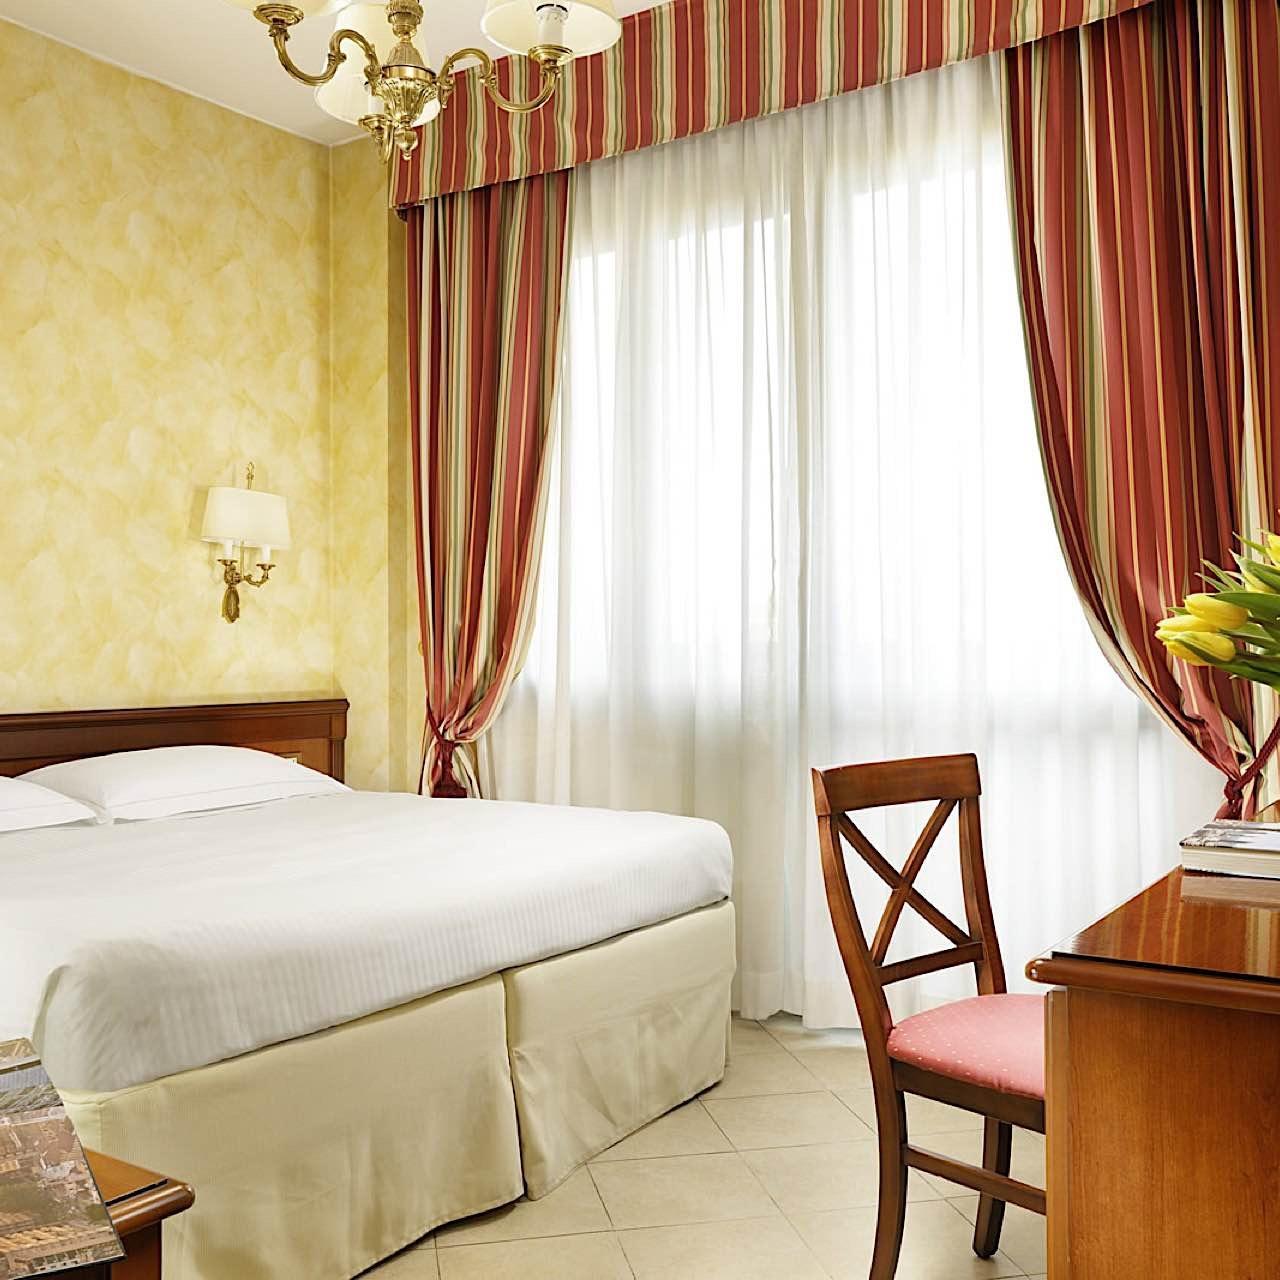 Executive Room | Linea Uno Hotel & Residence Milano